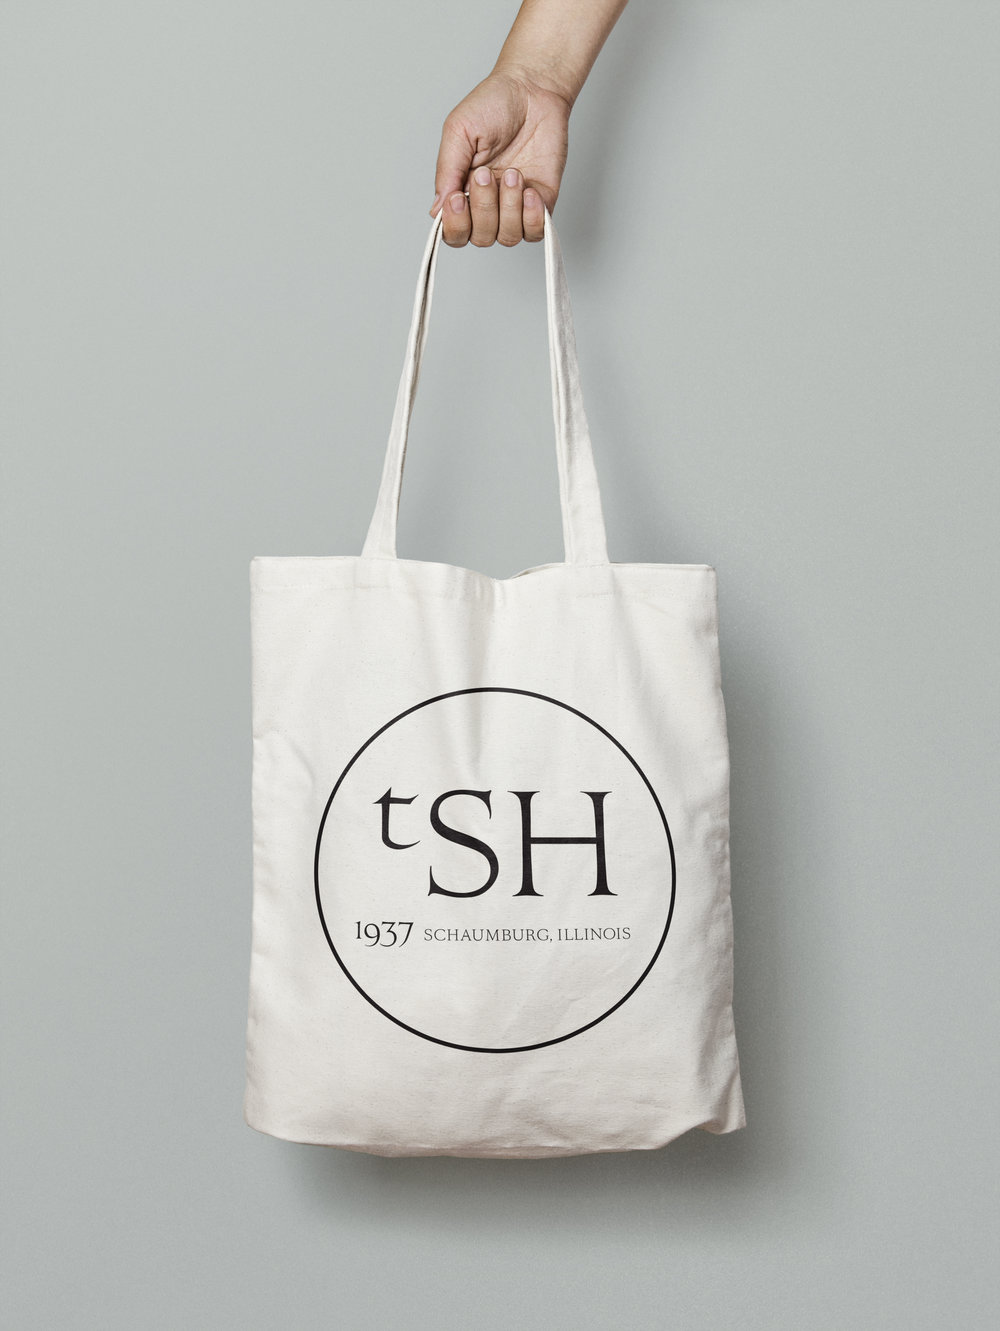 SCHWEIKHER - EXPLORATION #1 - tote bag